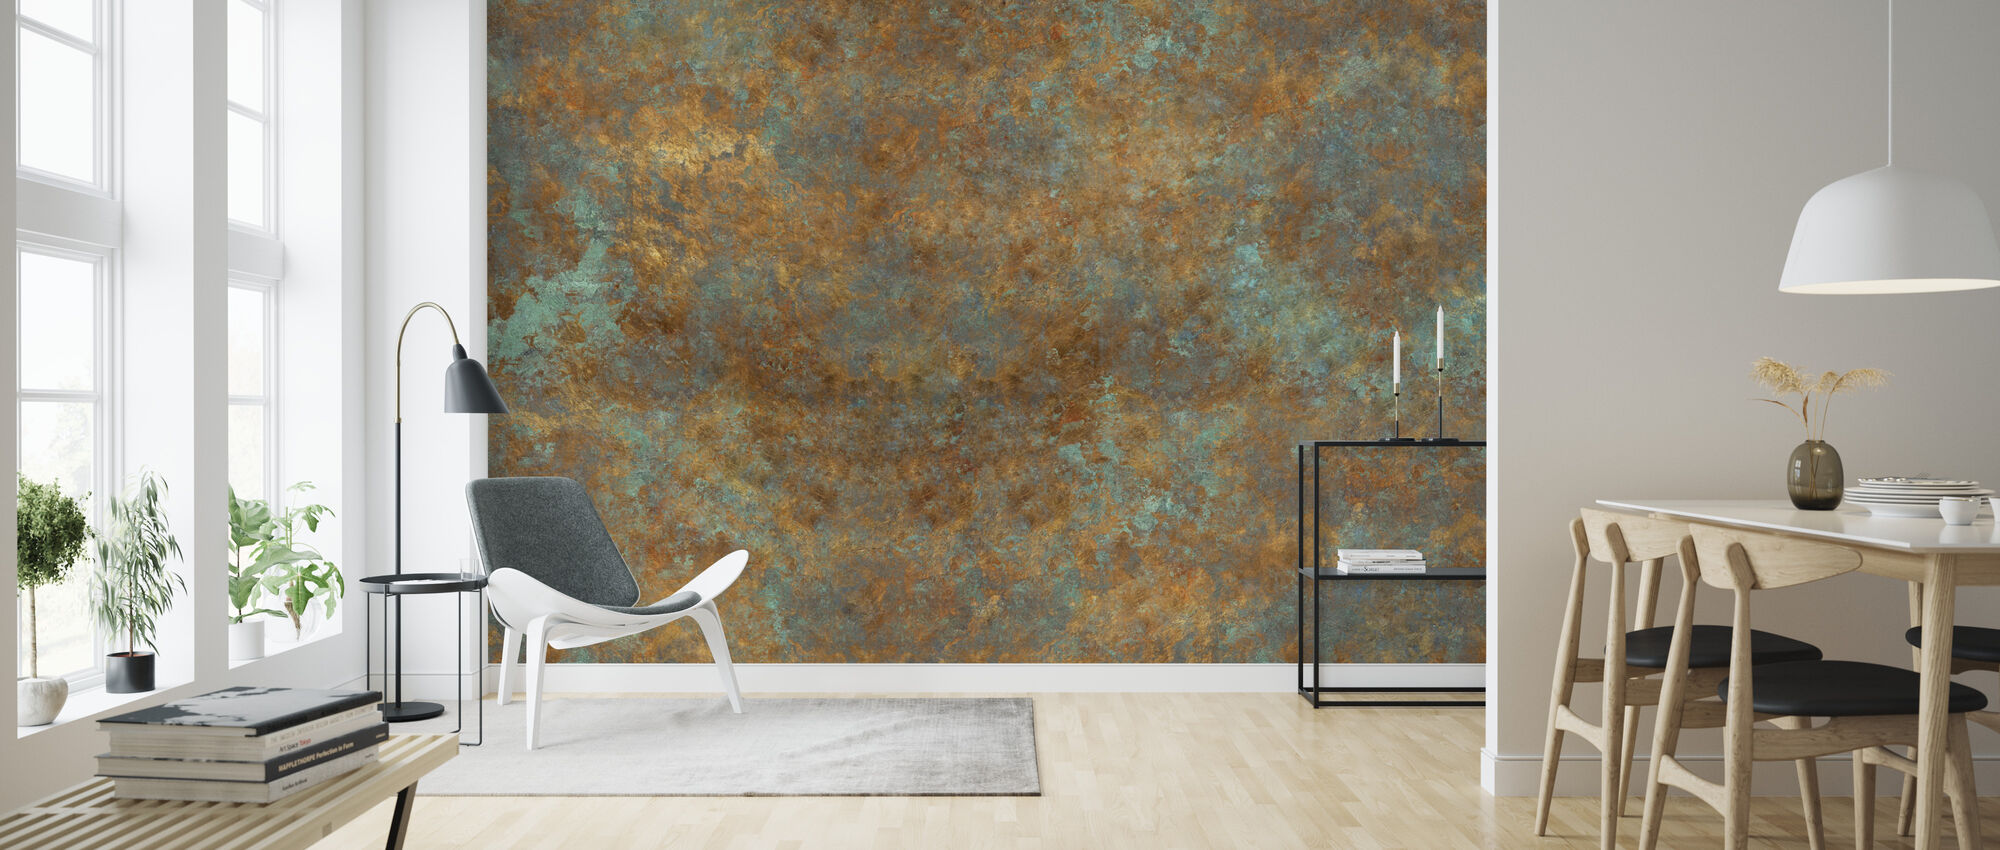 Vintage Bronzen Achtergrond - Behang - Woonkamer